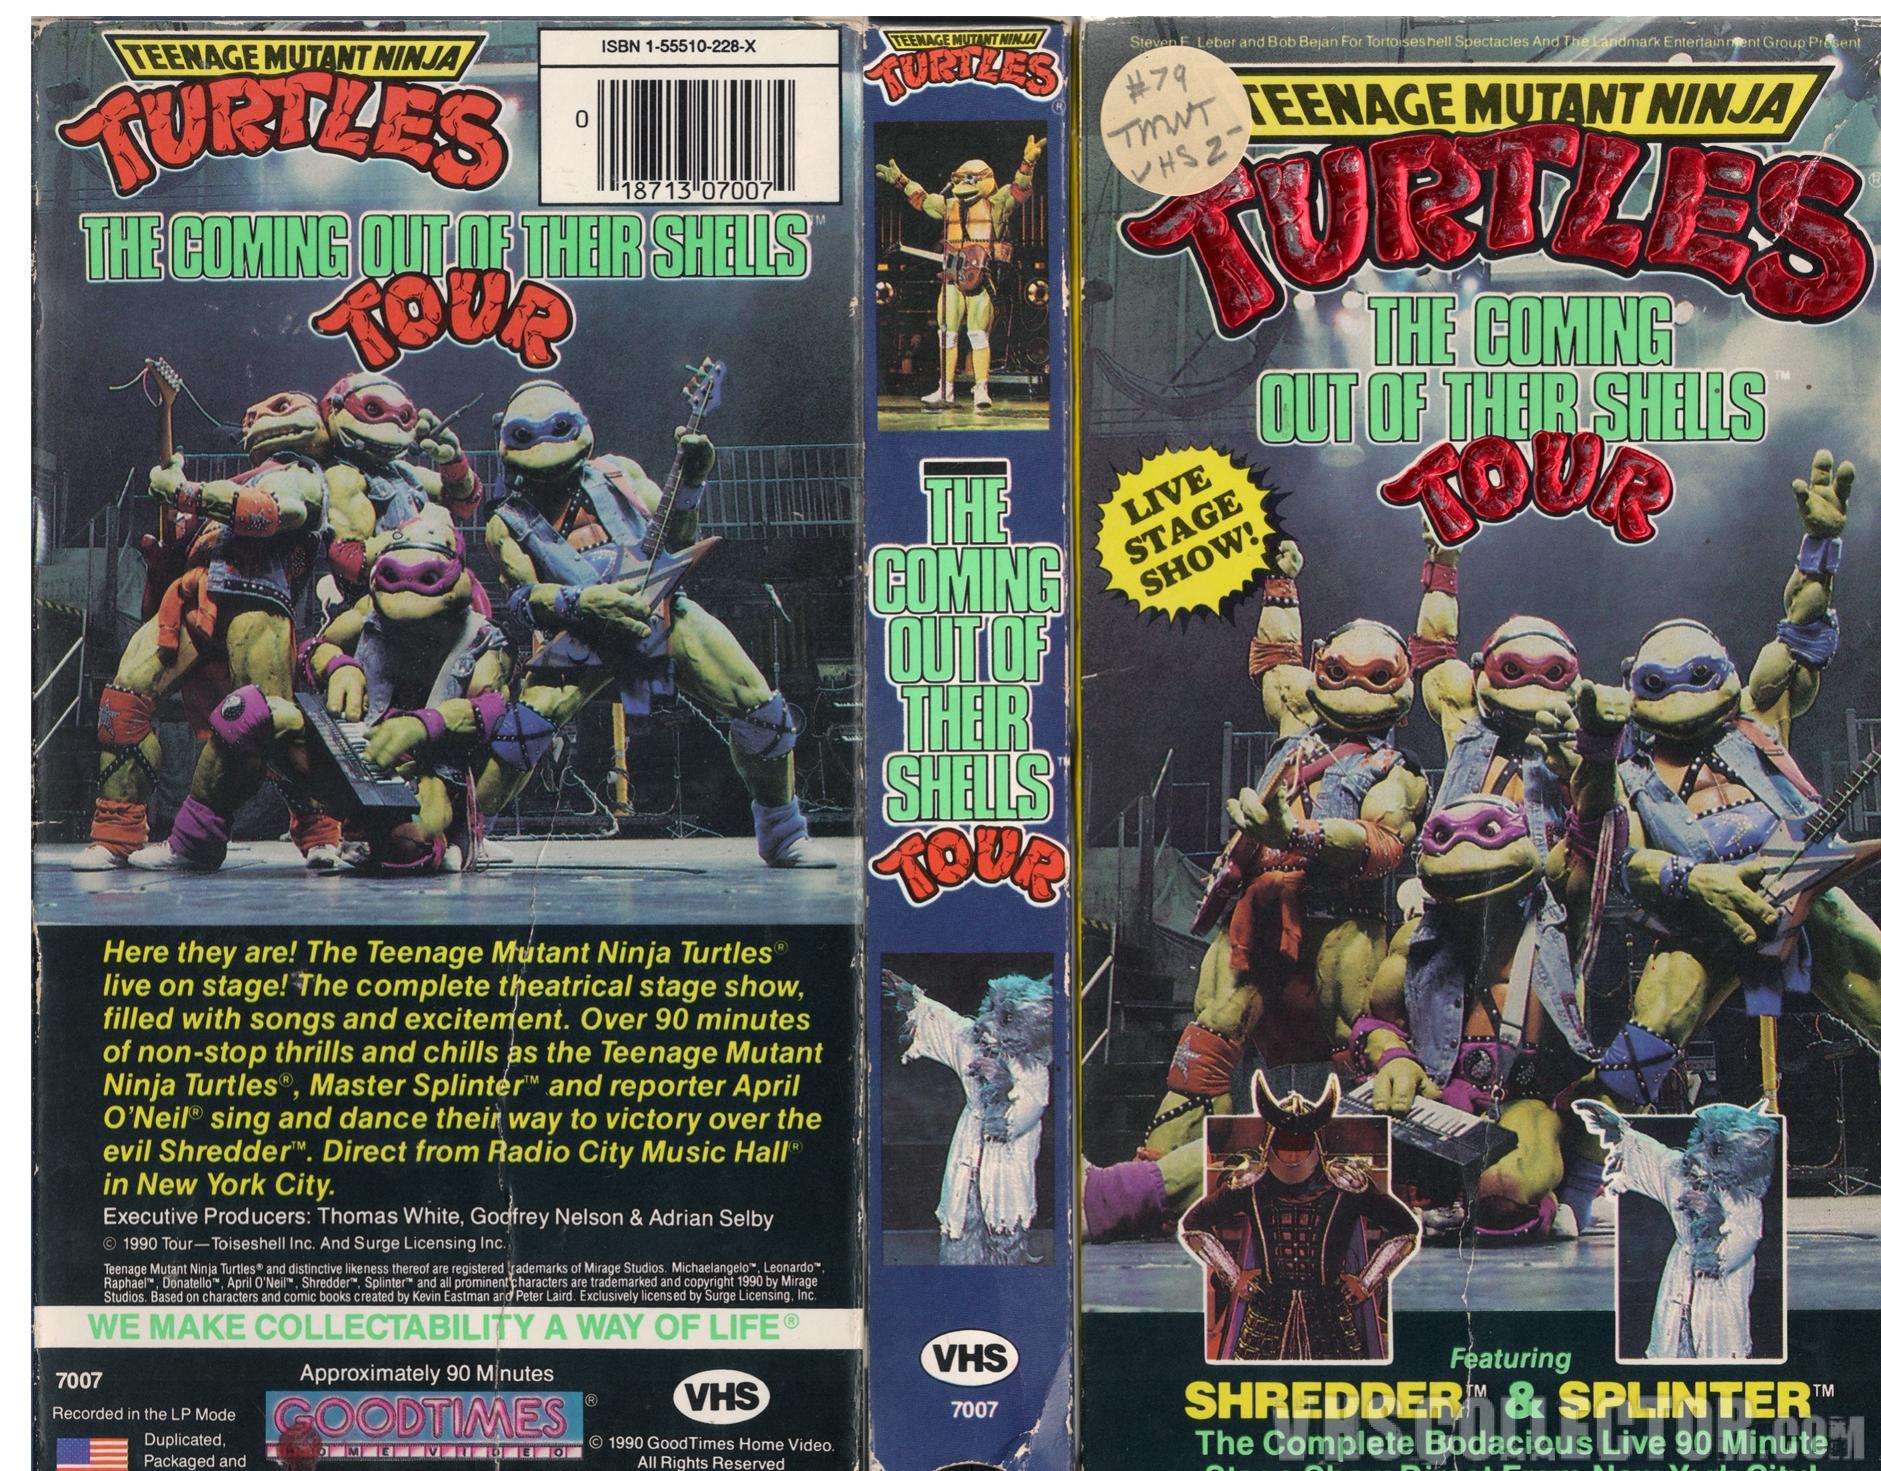 Teenage Mutant Ninja Turtles Coming Out Of Their Shells